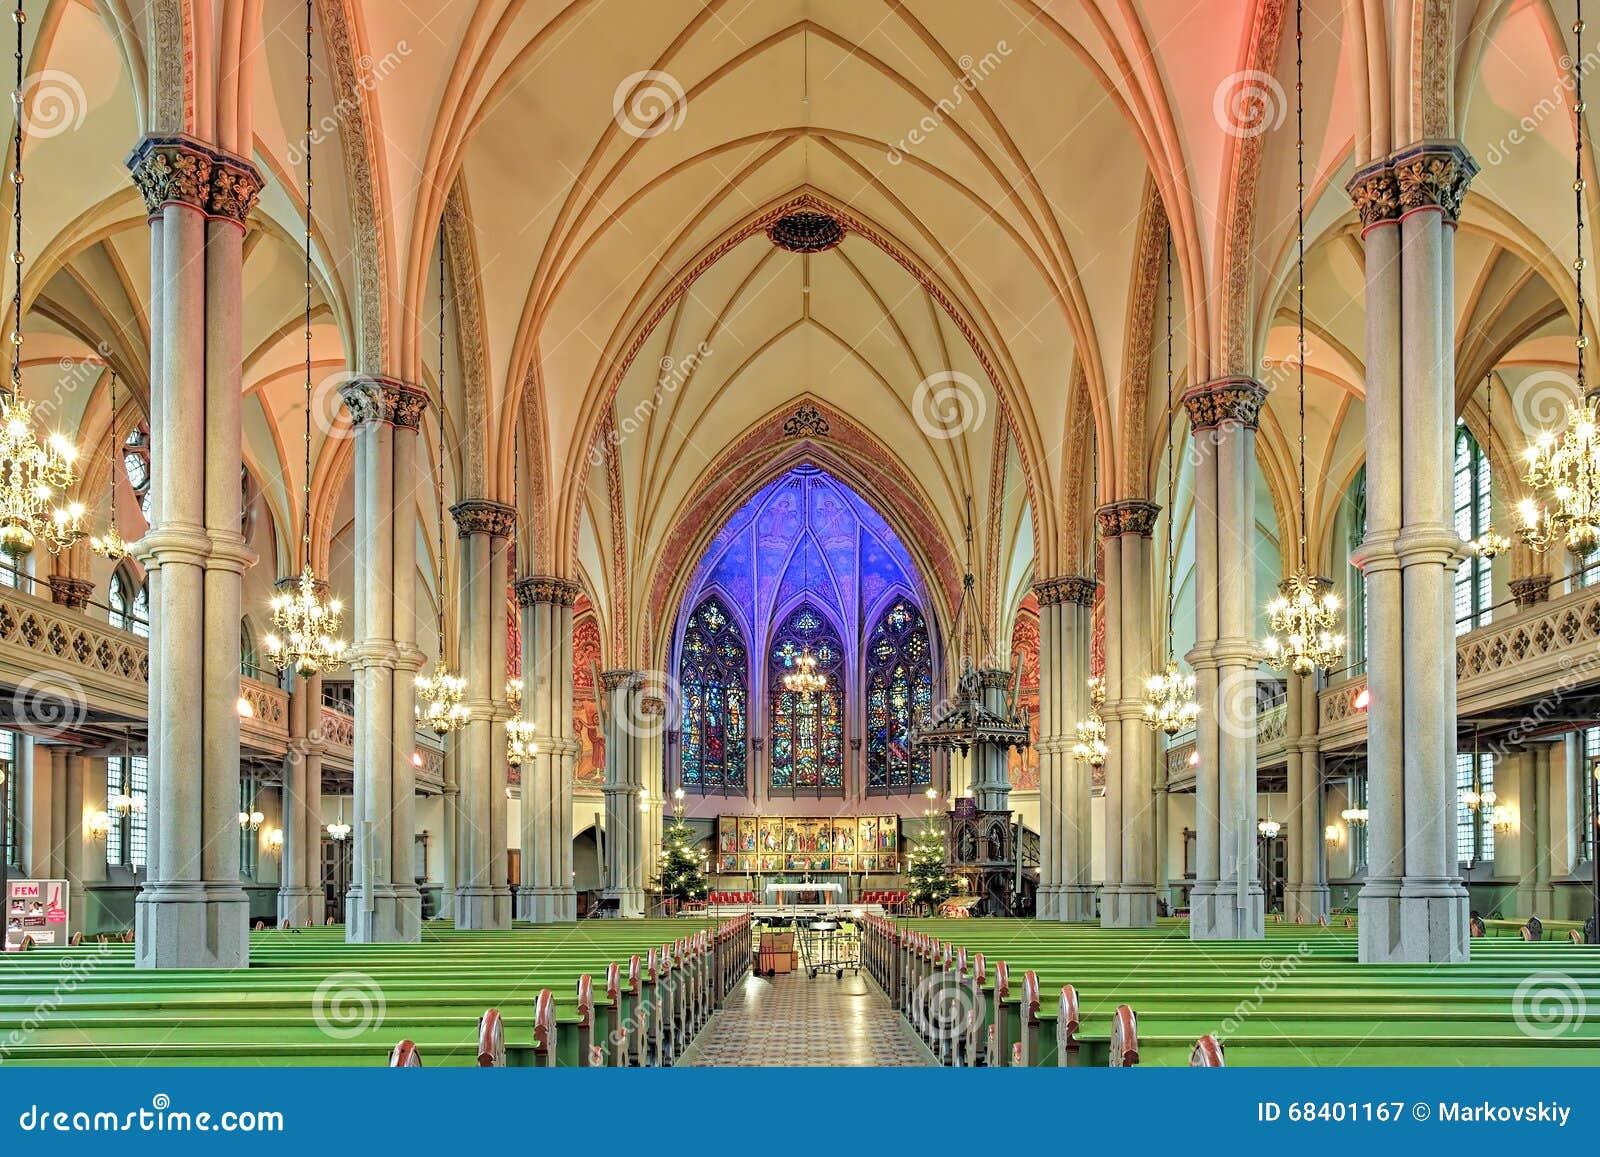 Interior Of Oscar Fredrik Church In Gothenburg Sweden